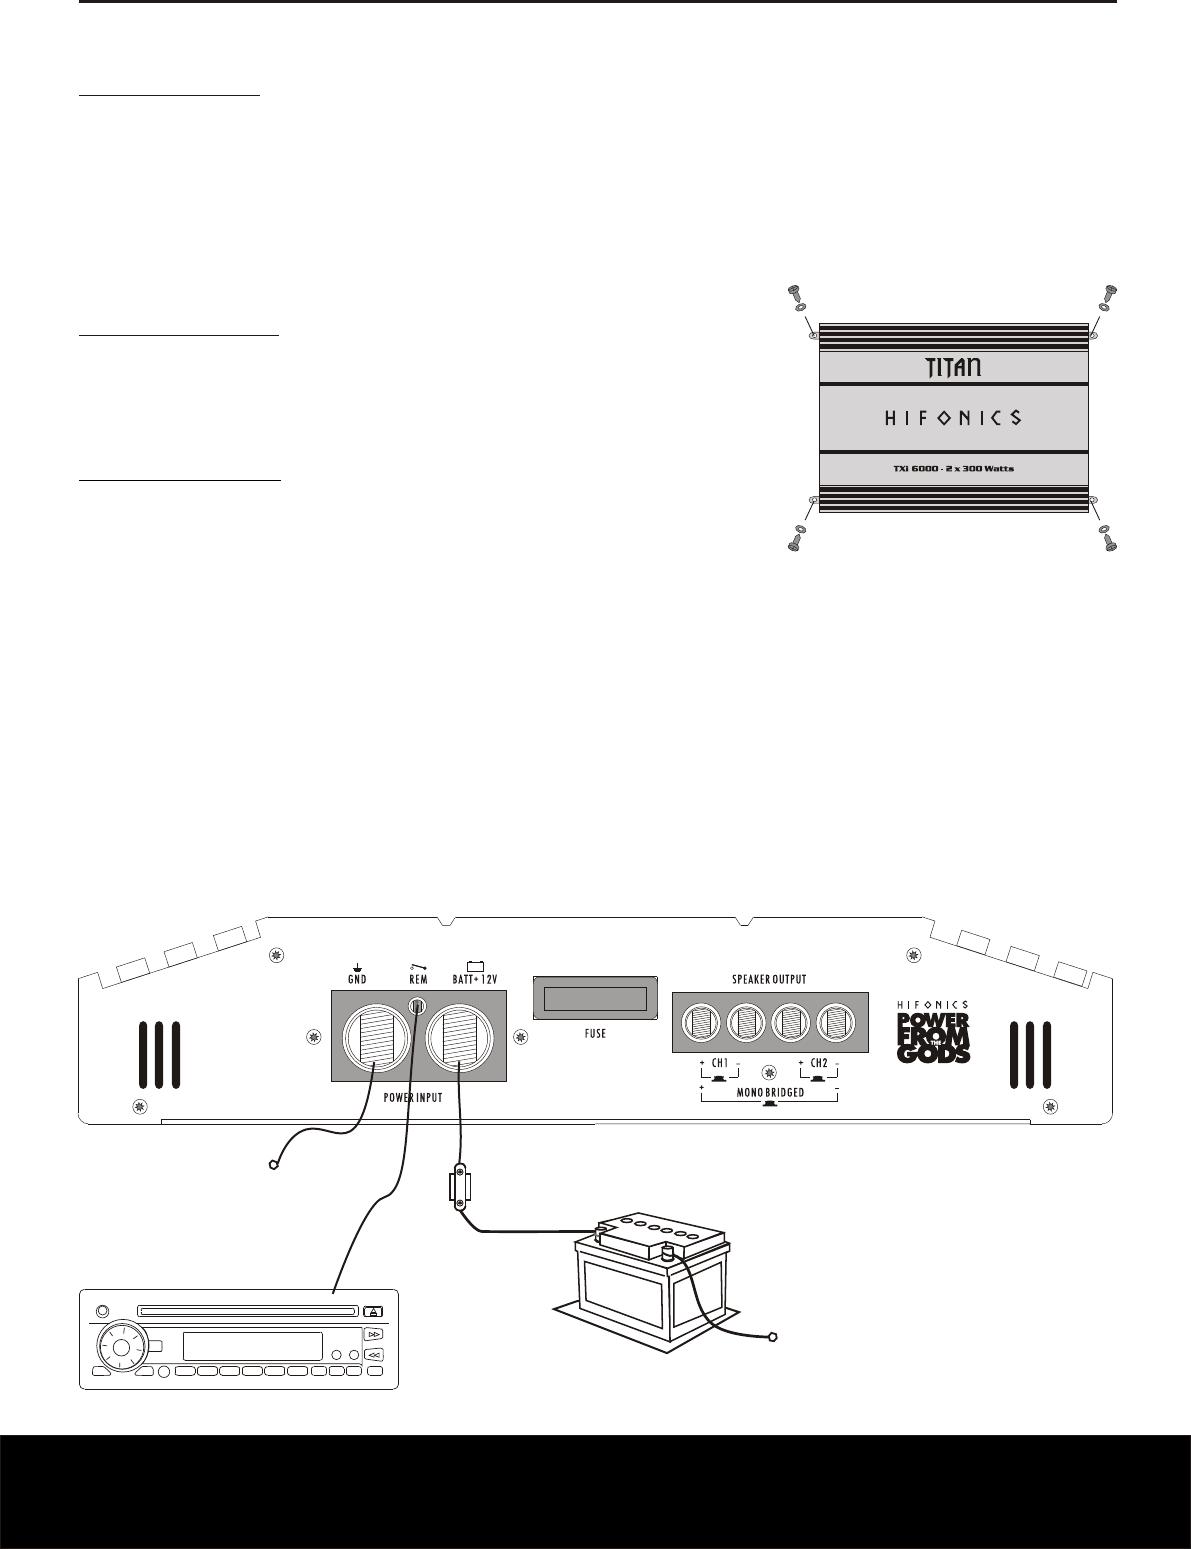 Handleiding Hifonics Txi 6000 Pagina 20 Van 24 Deutsch English Wiring Diagram Installationshinweise